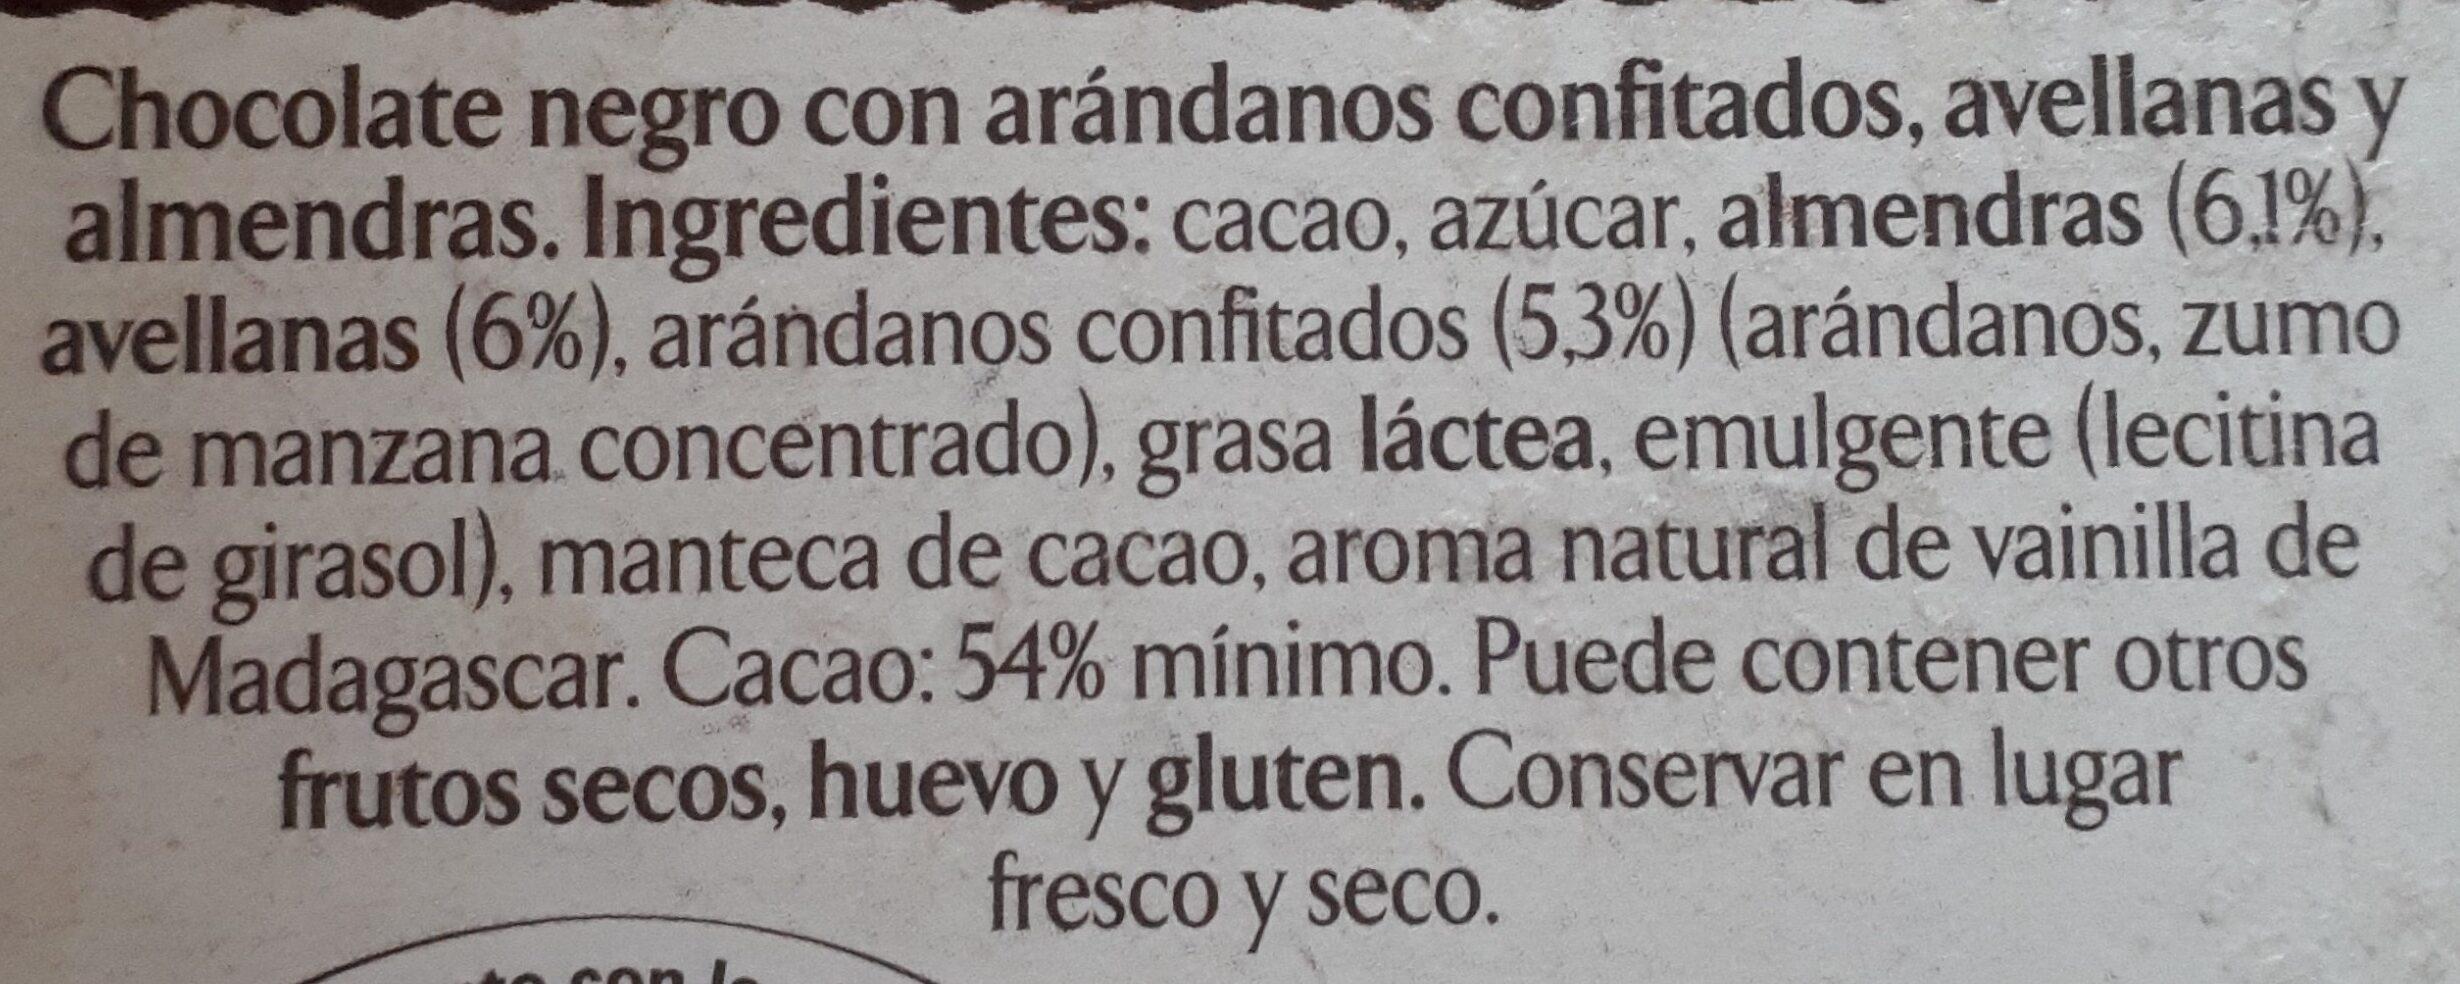 Chocolate negro almendras & avellanas - Ingredients - es